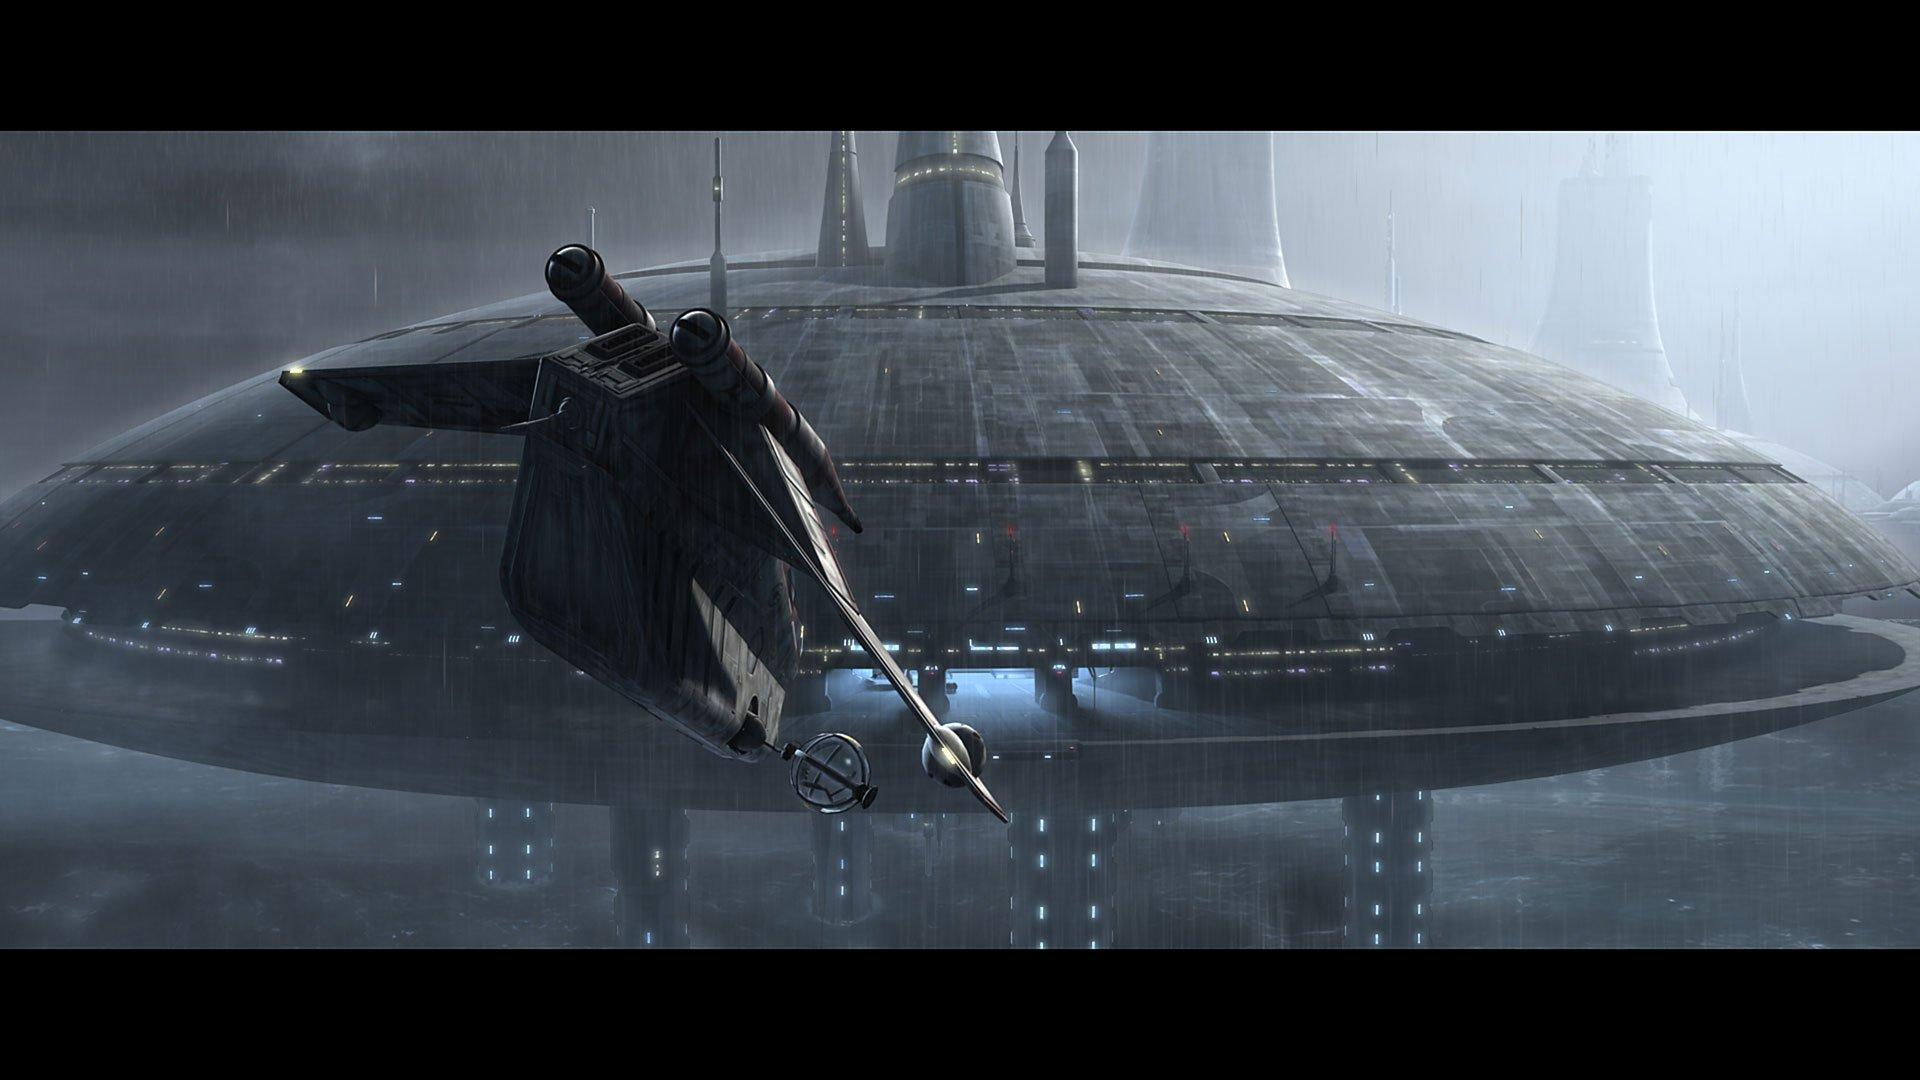 Kamino Base | Star Wars | Pinterest | Starwars, Landing ... Kamino